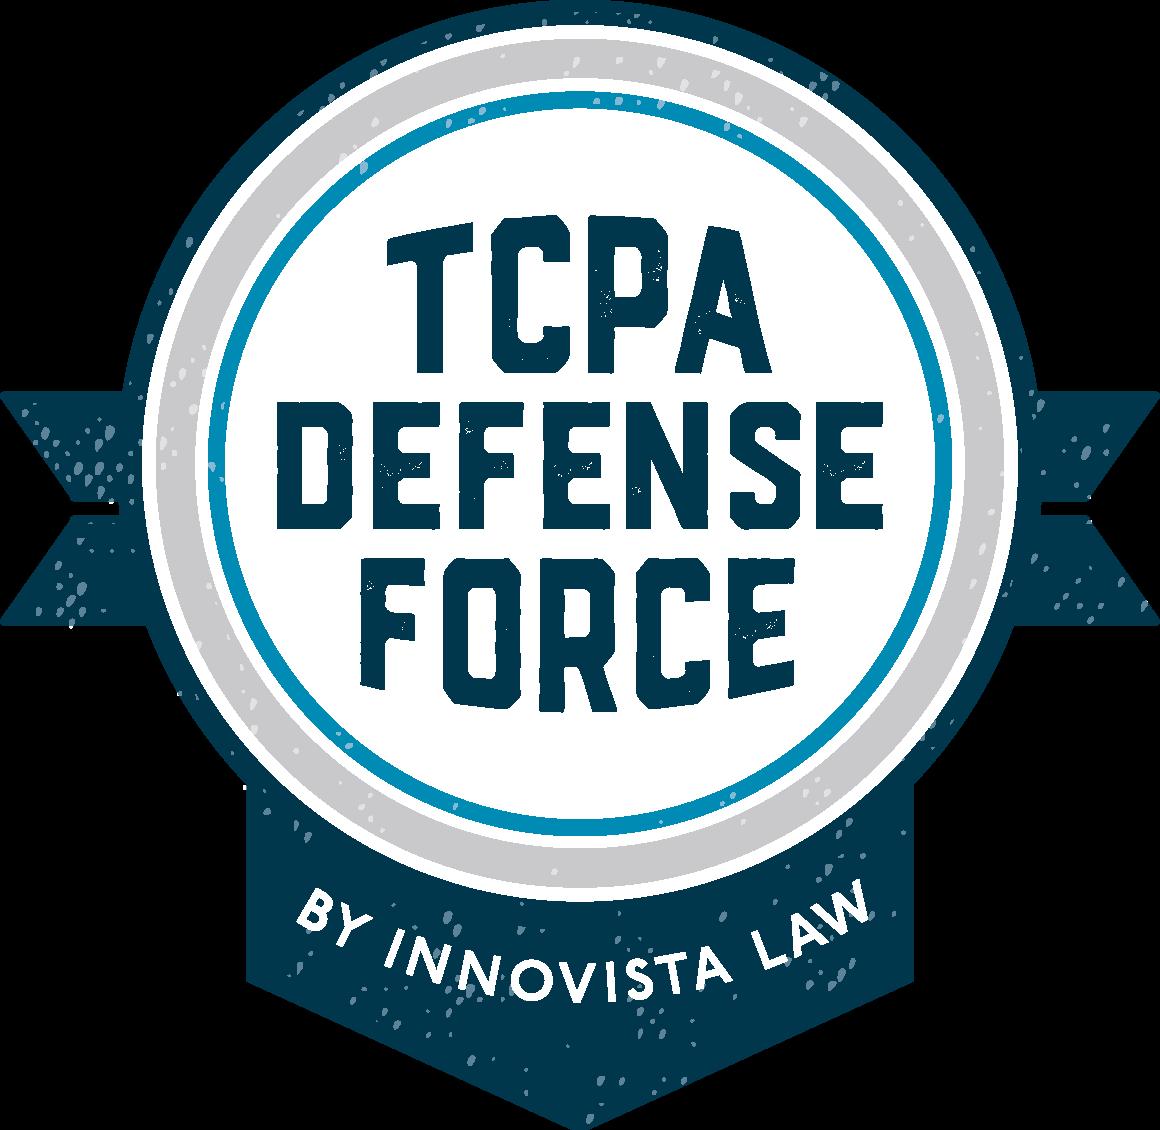 tcpa-defense-force-innovista-law-logo.png